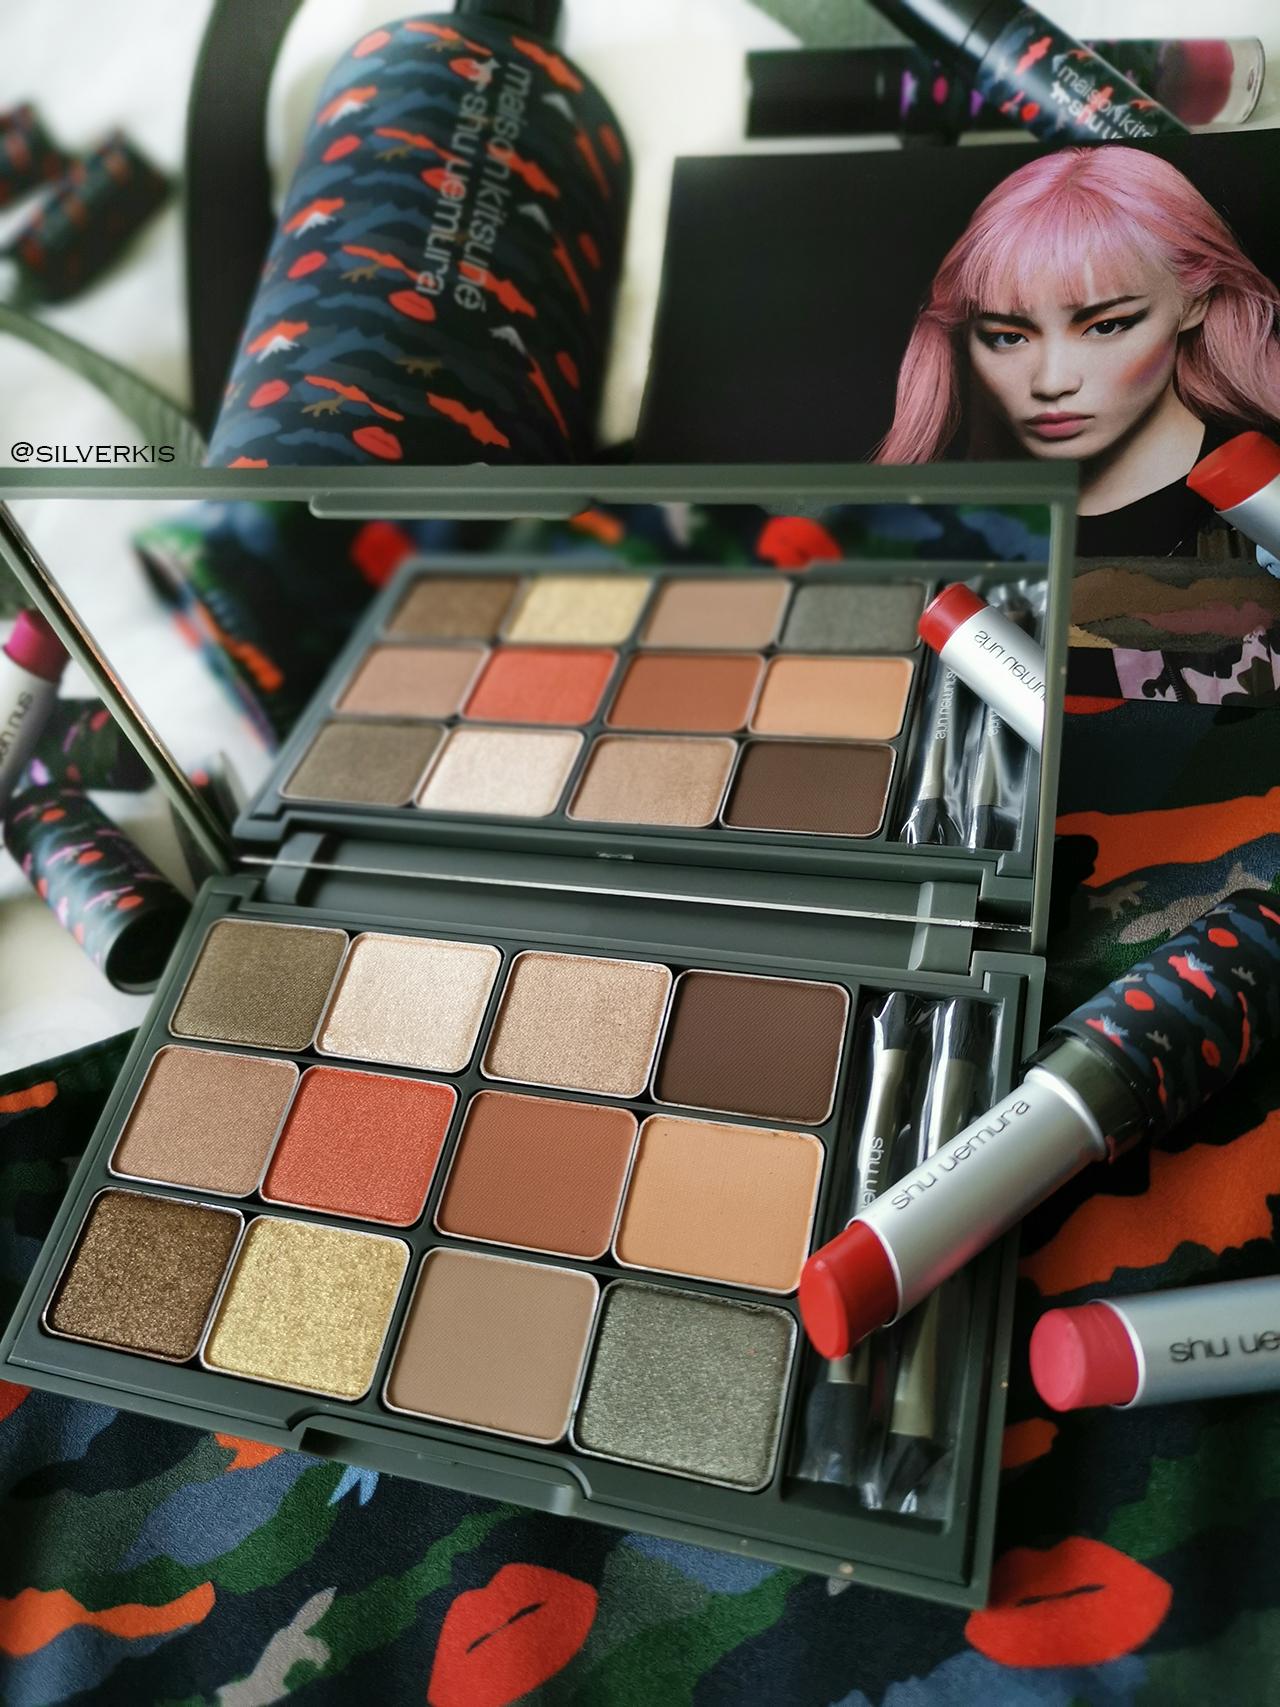 Maison Kitsuné x shu uemura Camo Eyeshadow Palette